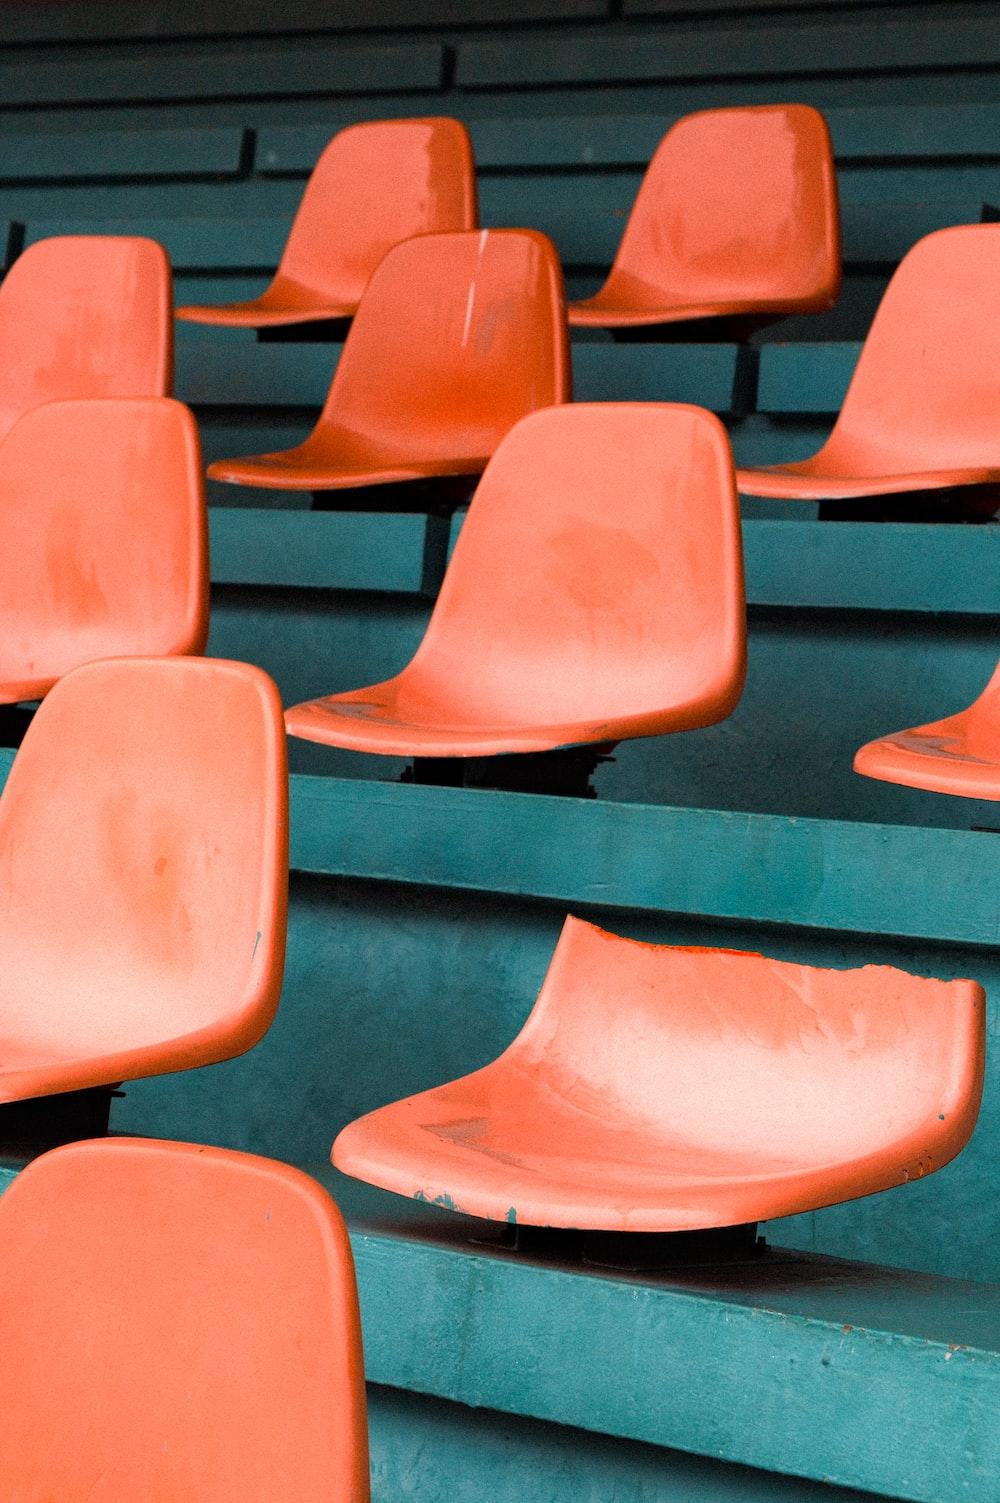 orange chairs